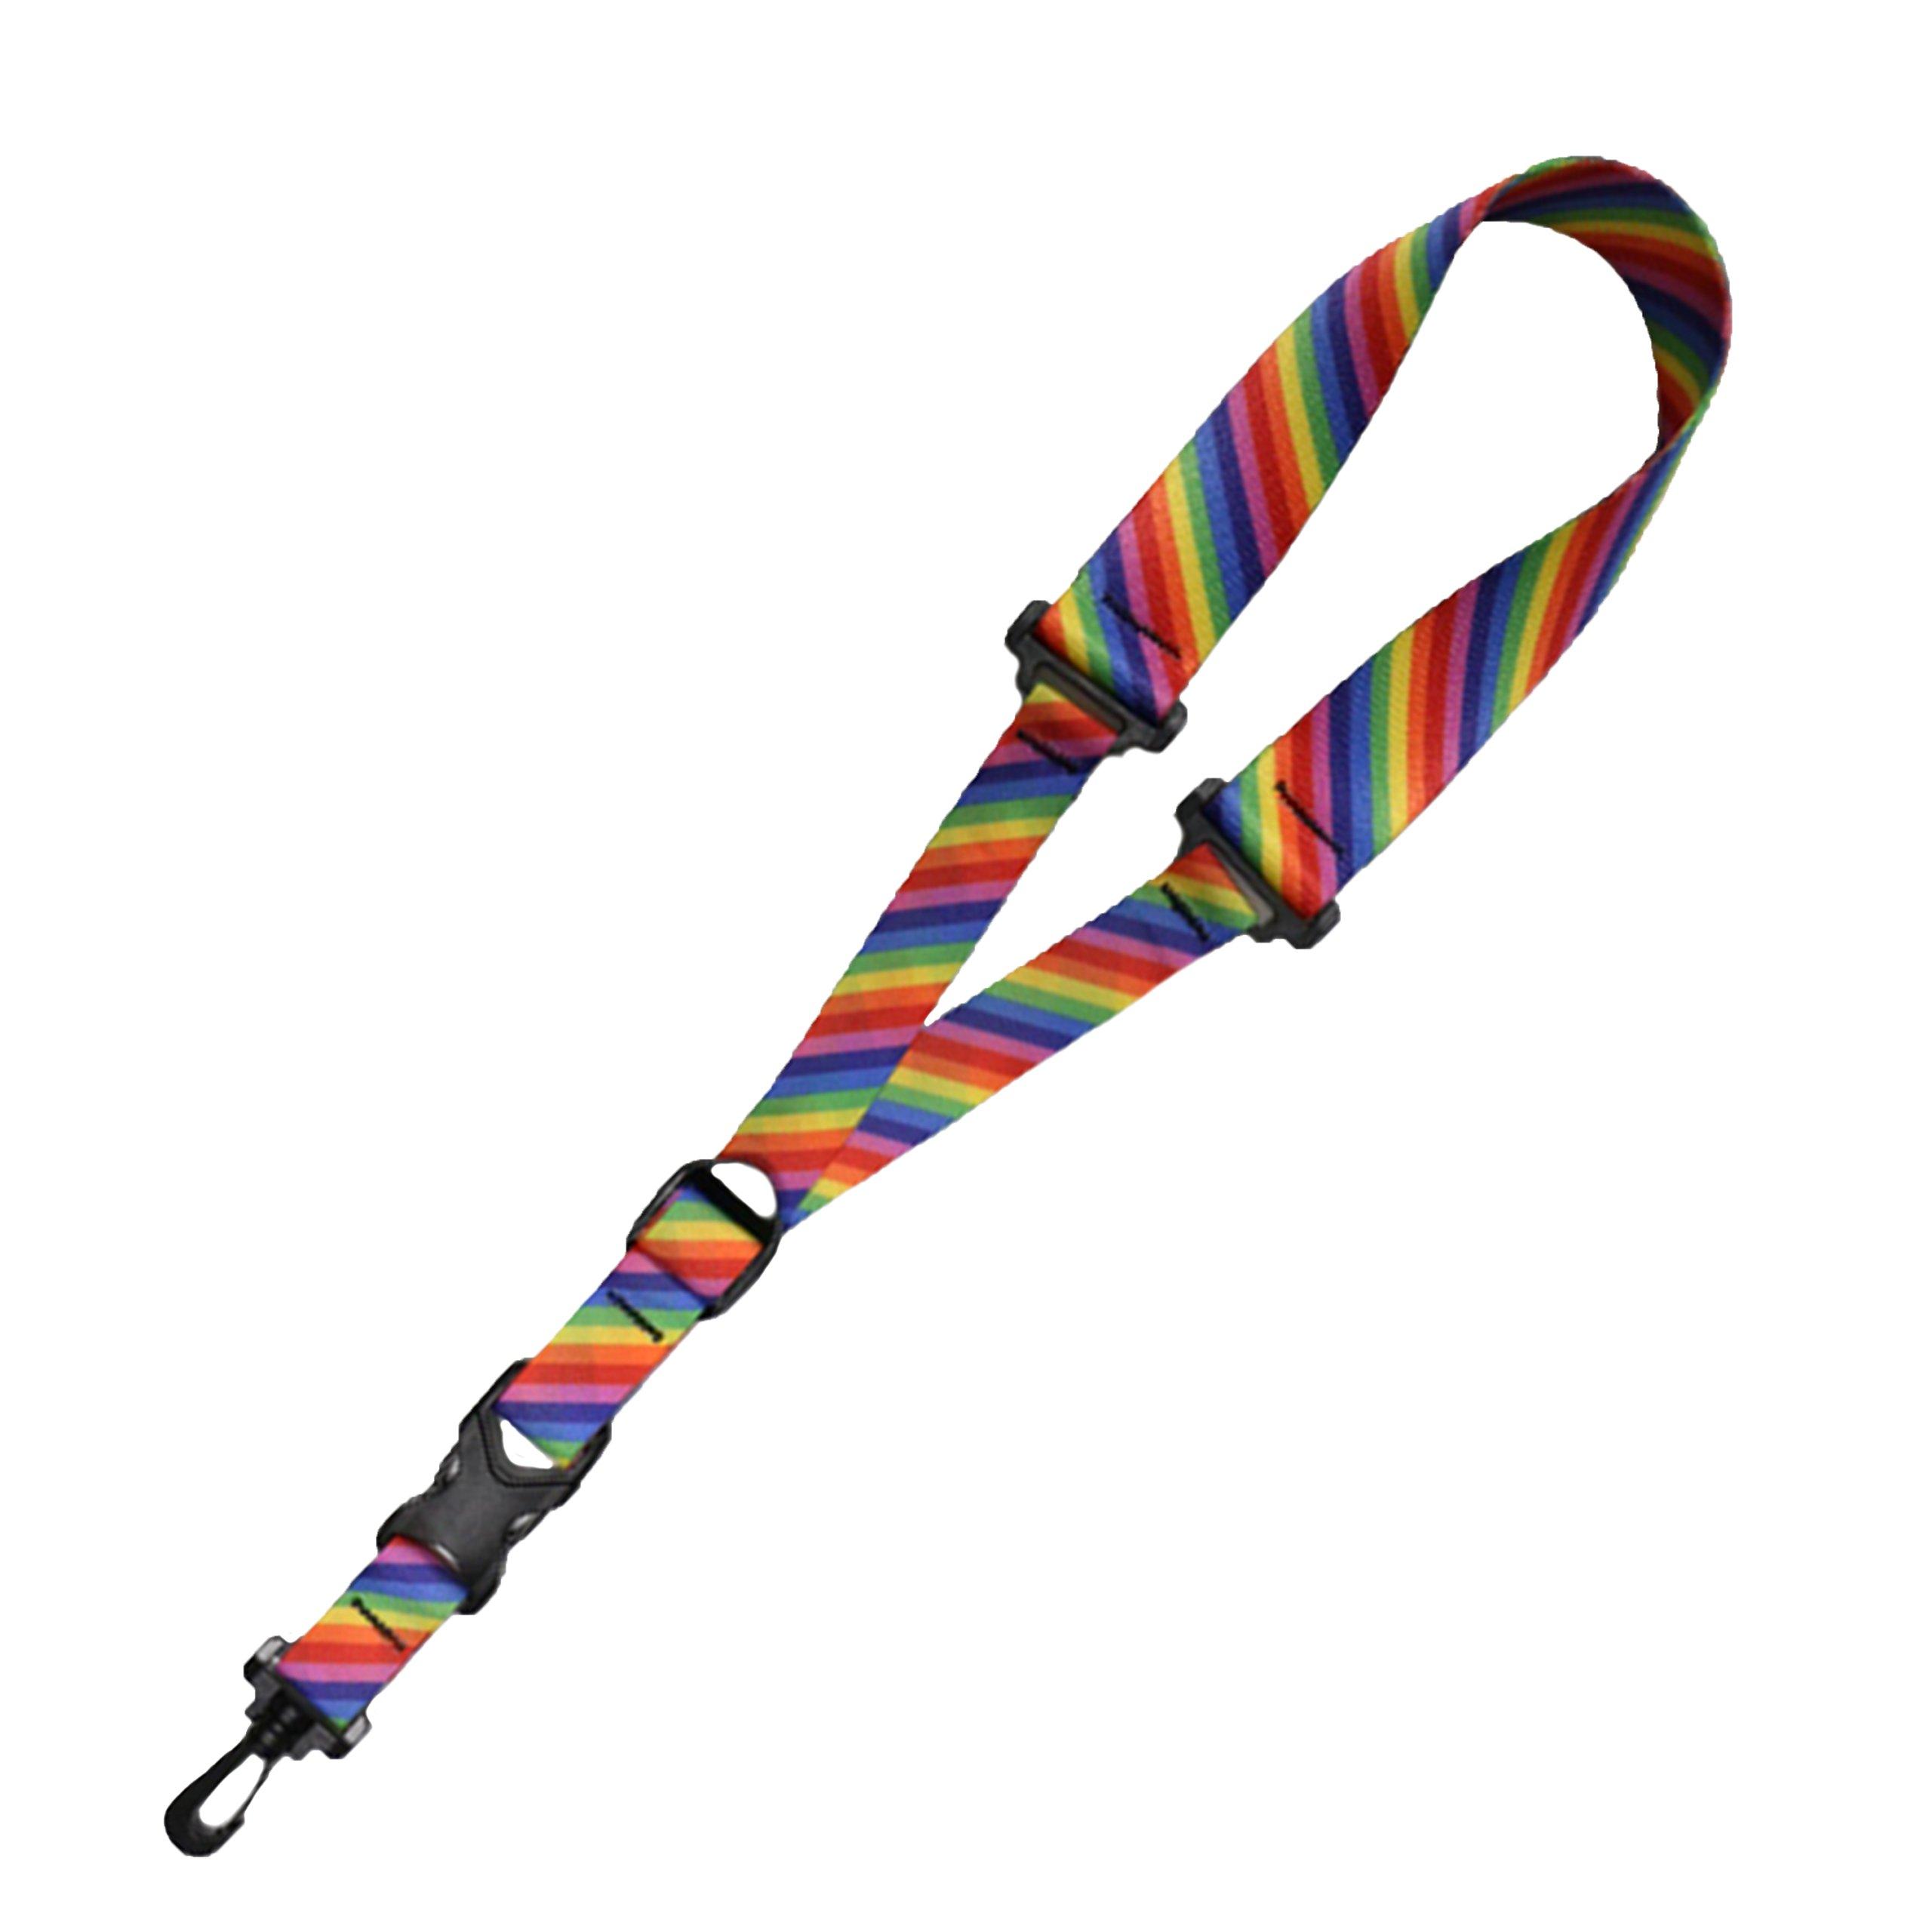 Killer-Q Saxophone Strap - Stylish Quick Release, Adjustable Sax Neck Straps, Made in USA – Rainbow Stripe Design